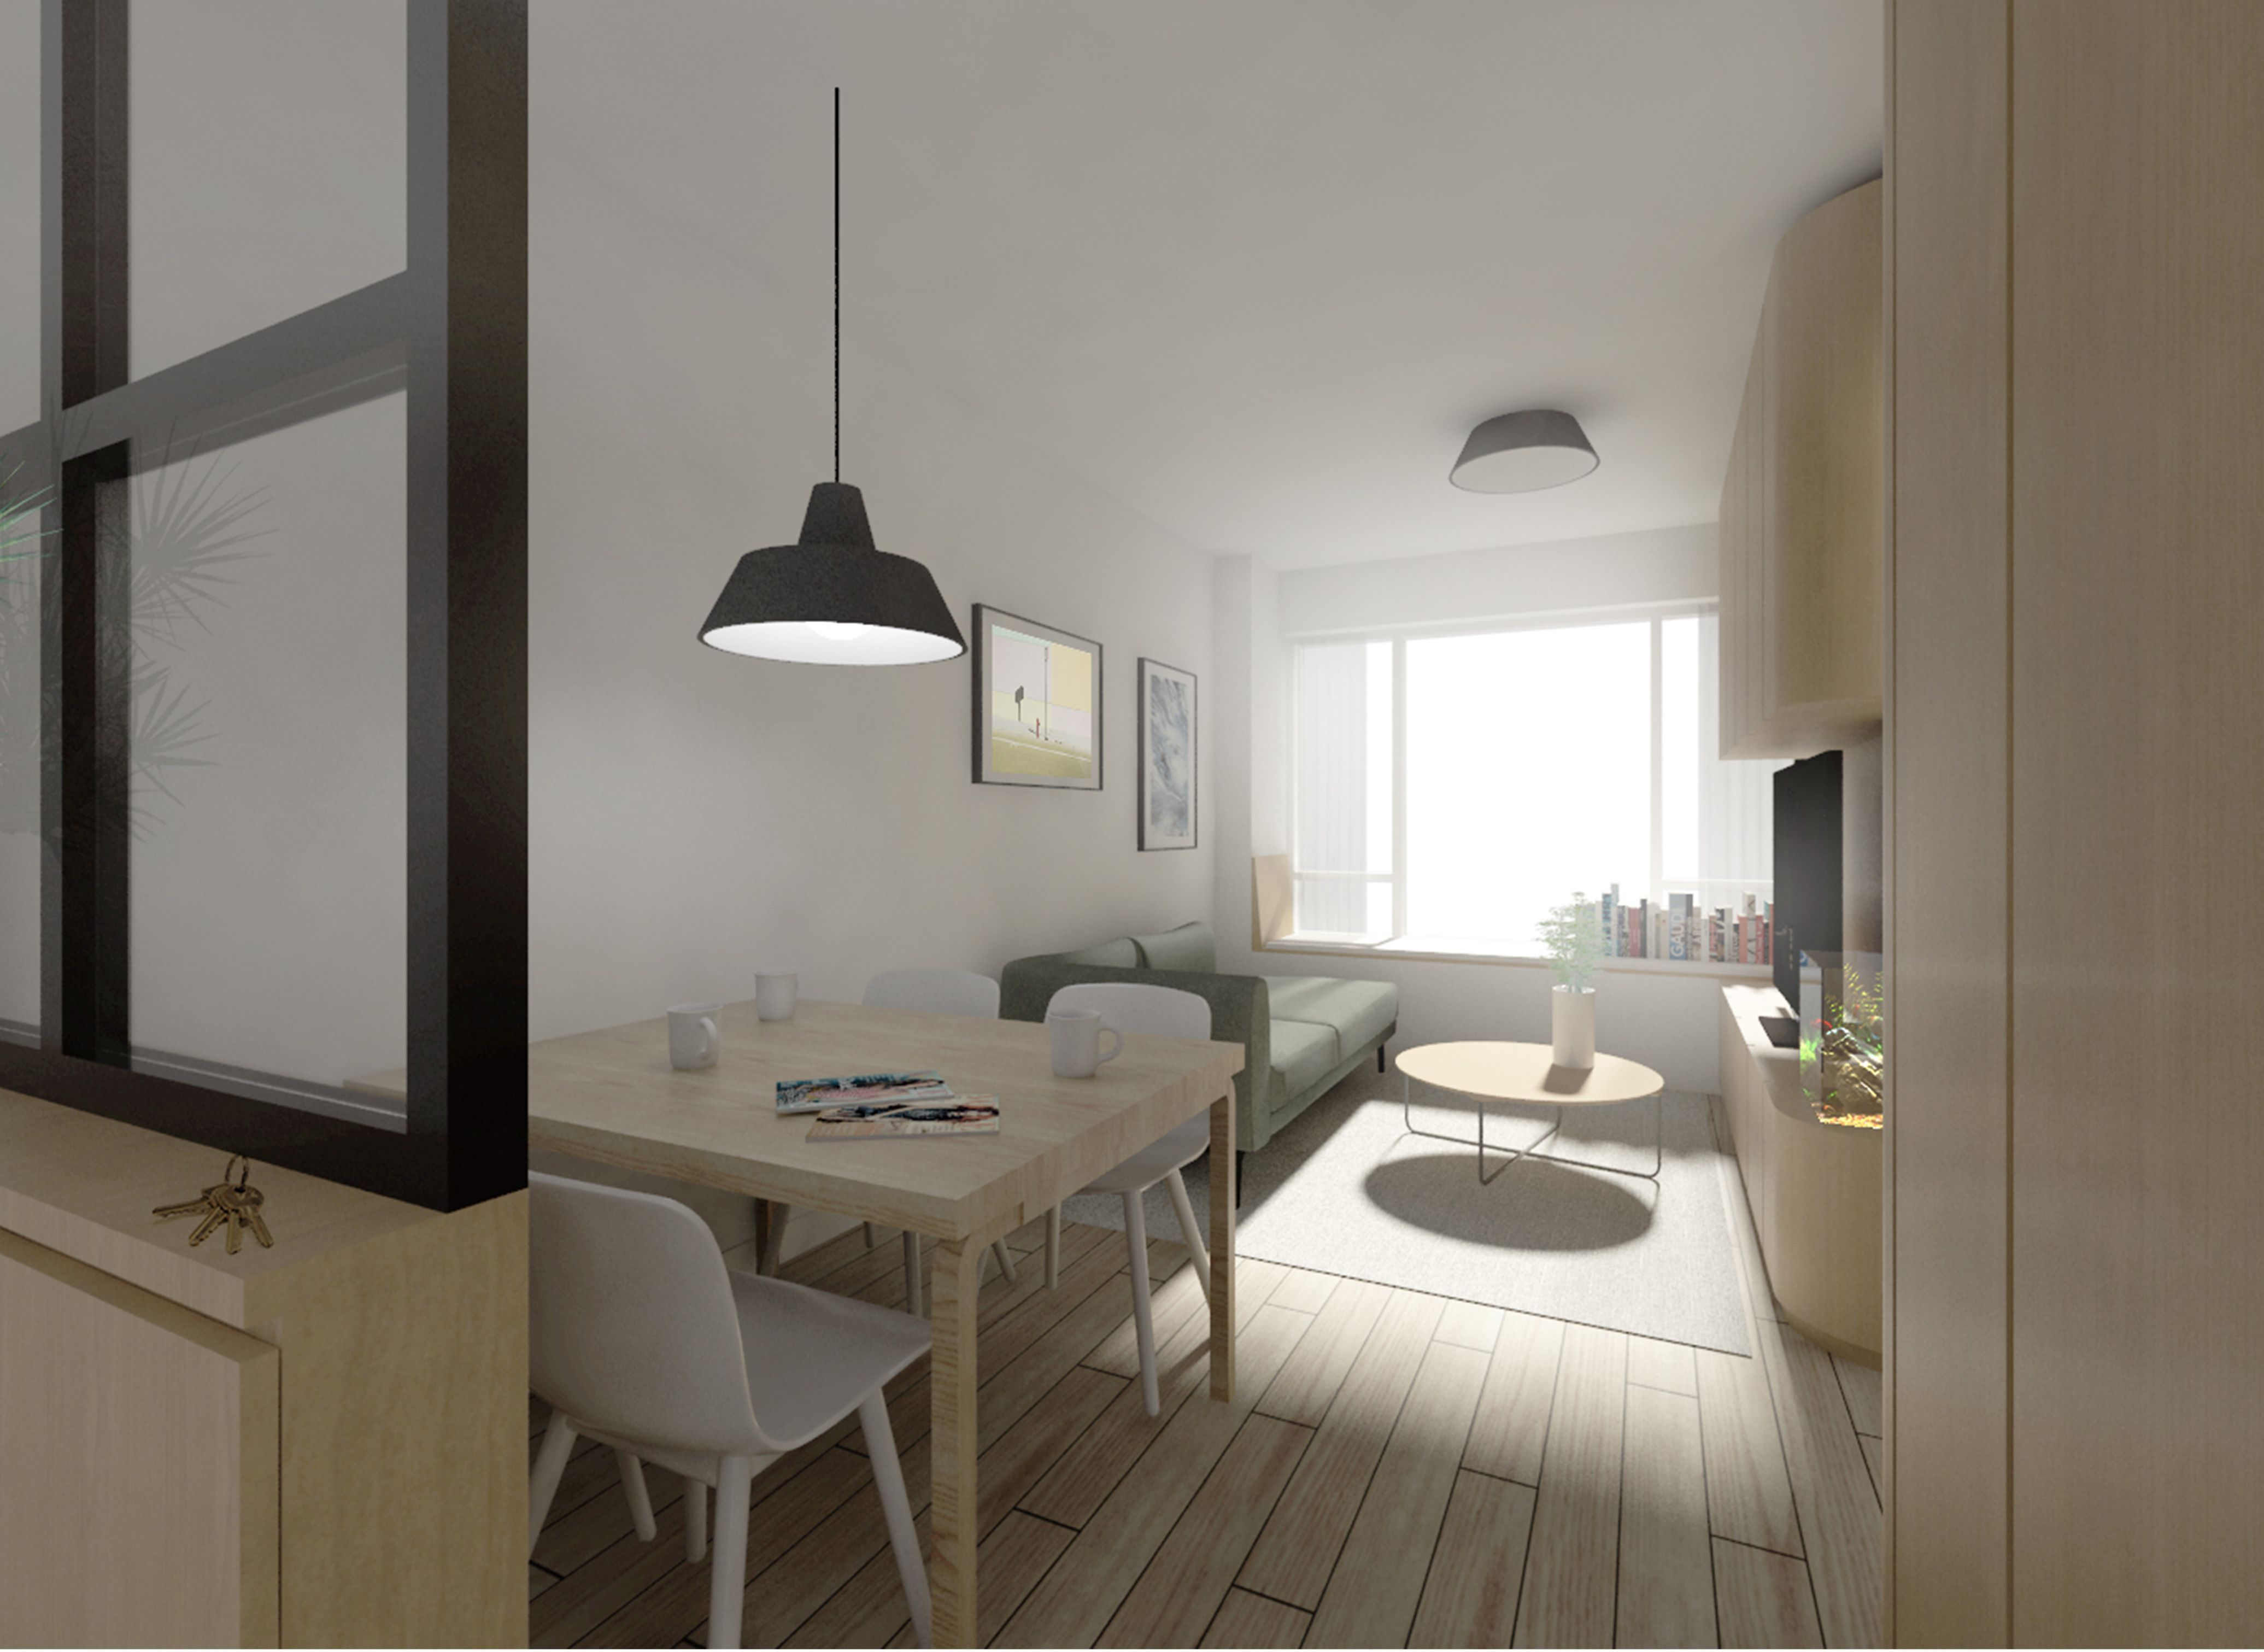 Small Living Room Arrangment Residential Interior Design Hong Kong Interior Designer Find The Best Residential Interior Design Small Space Design Interior